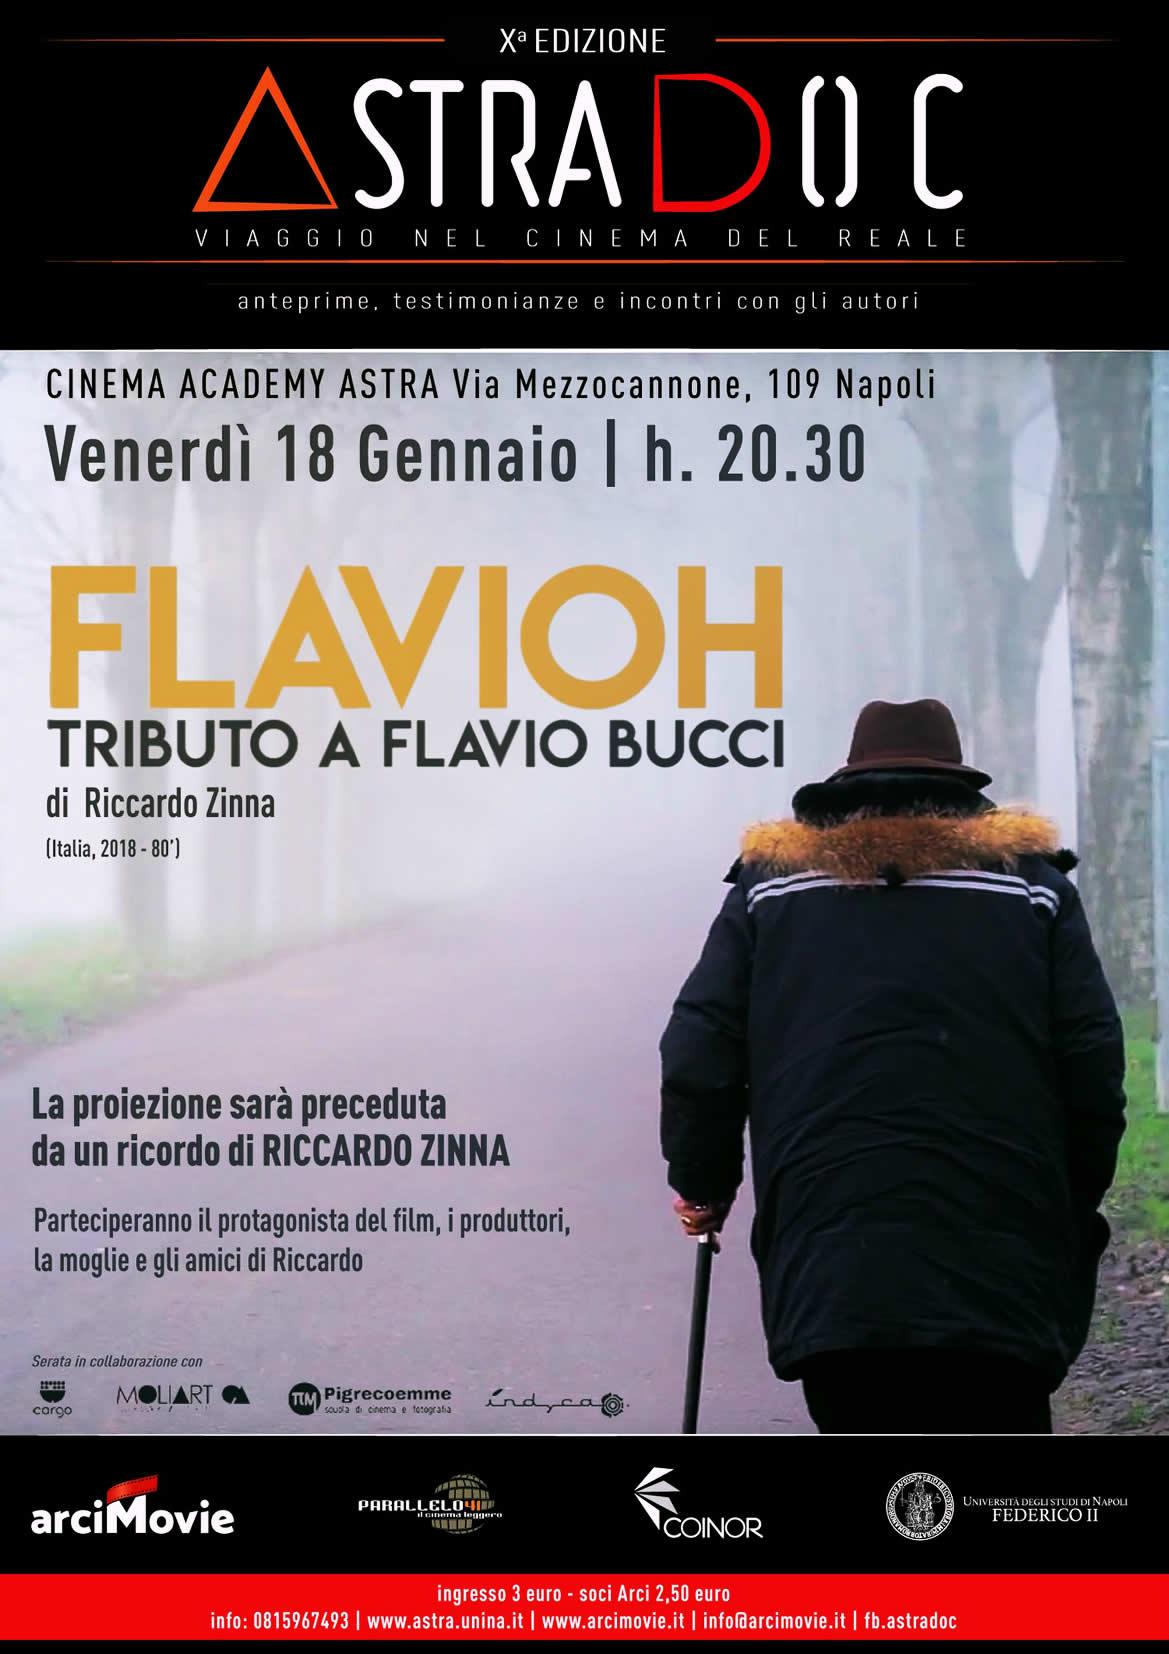 FLAVIOH, TRIBUTO A FLAVIO BUCCI - Un film di Riccardo Zinna